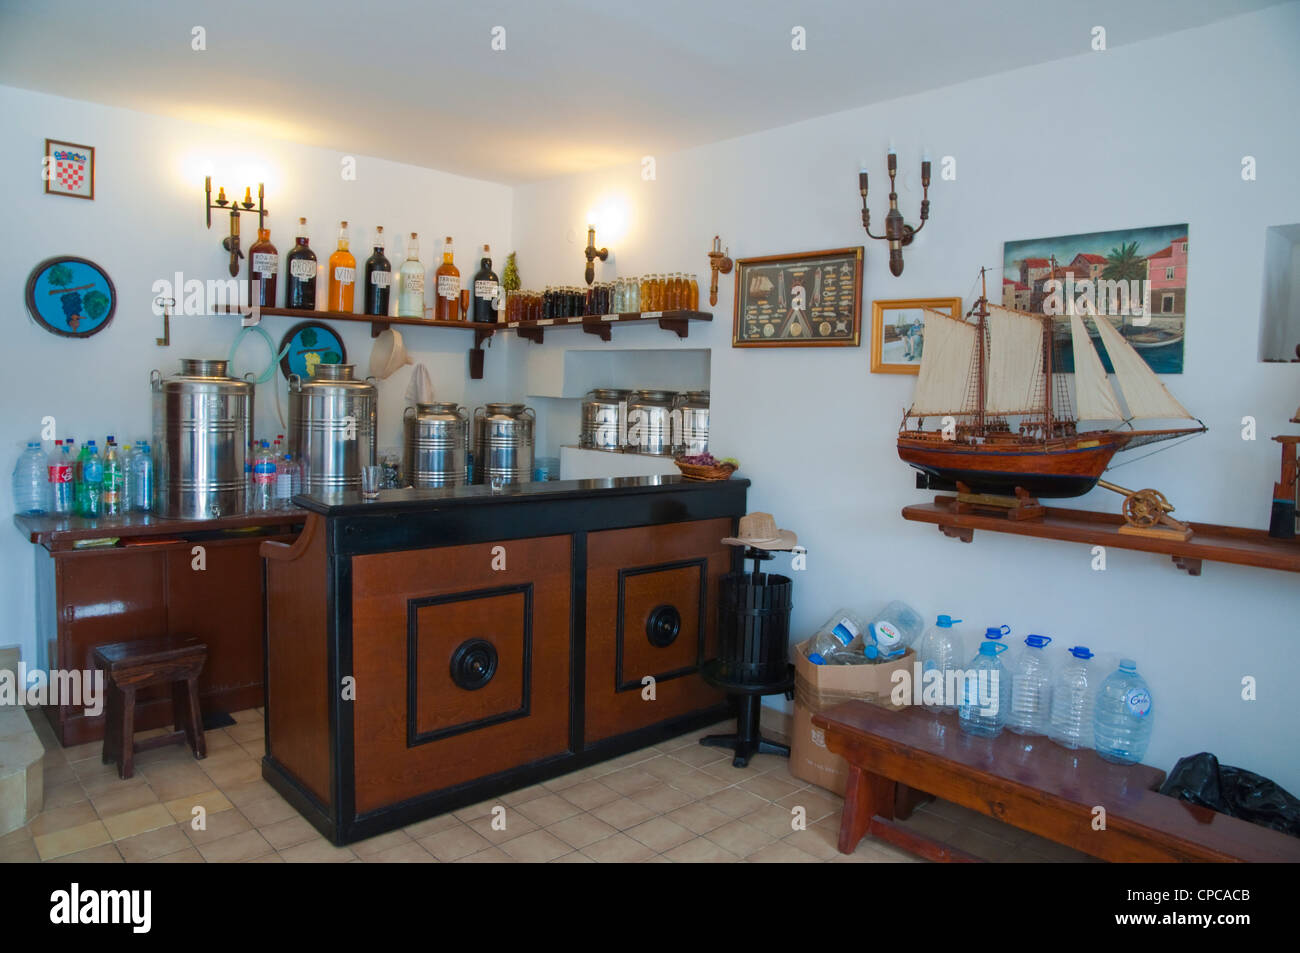 Wine bar and shop Stari Grad in Hvar island Croatia Europe - Stock Image